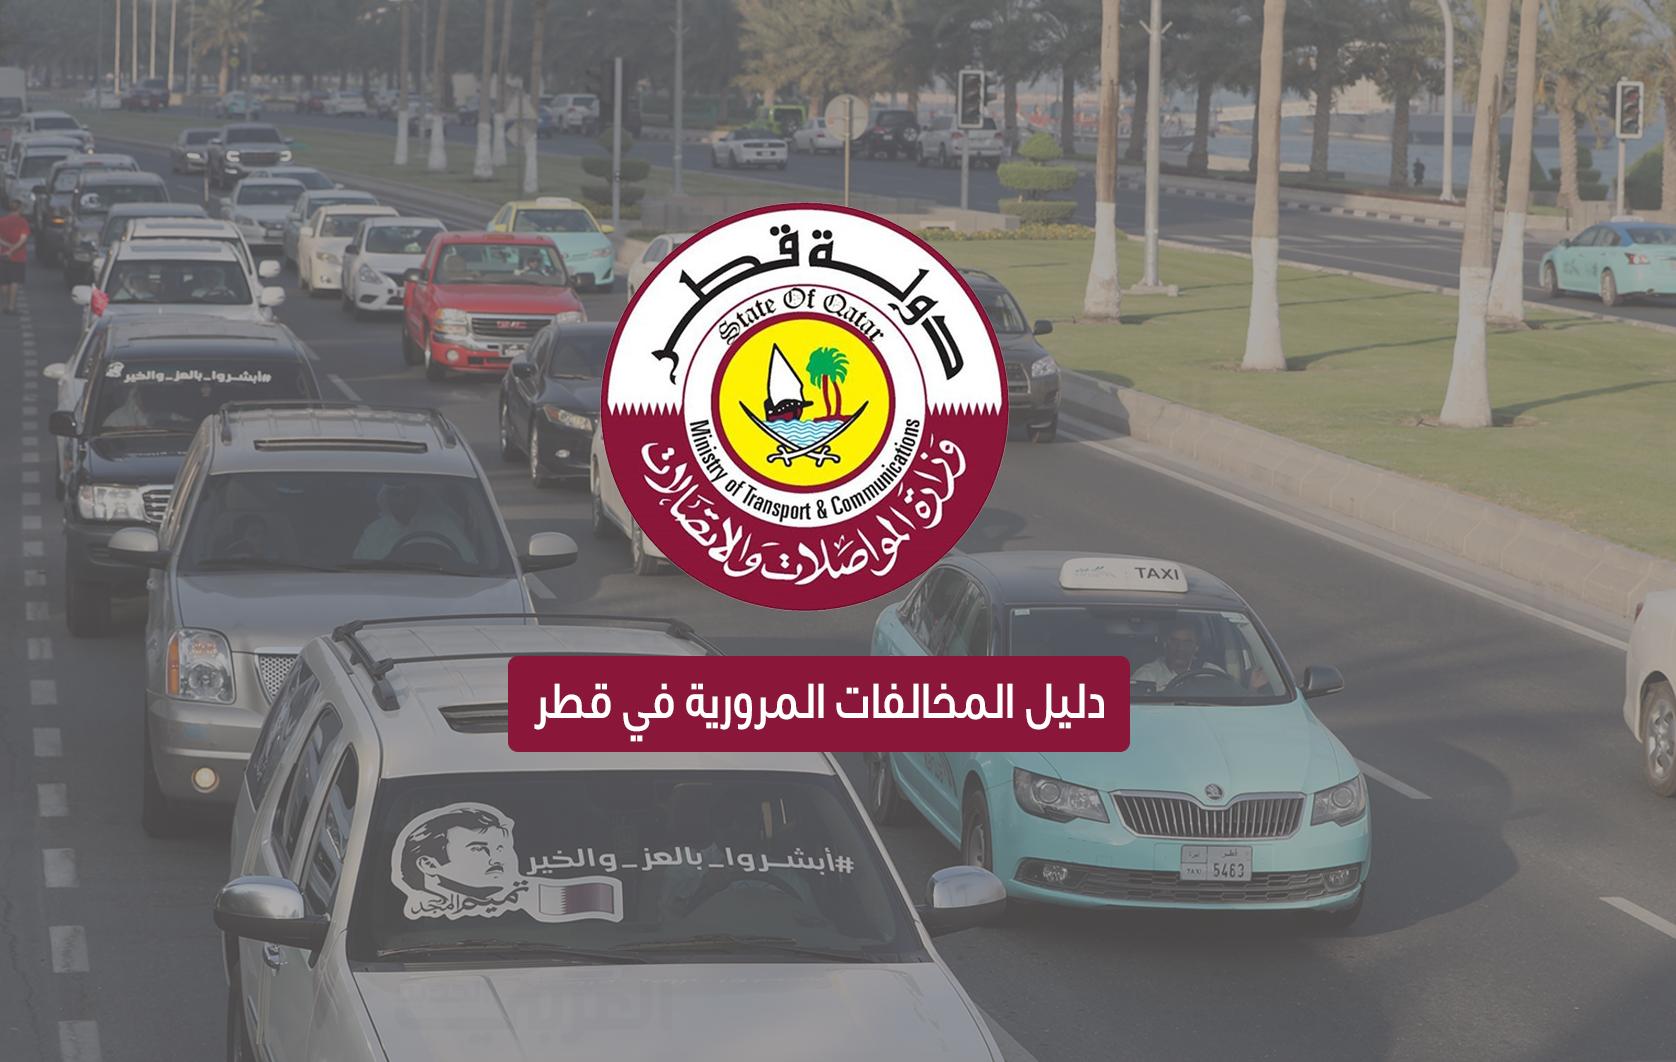 9b3e2f3a7 دليل المخالفات المرورية وأسعارها في قطر 2018 | كيو موتر